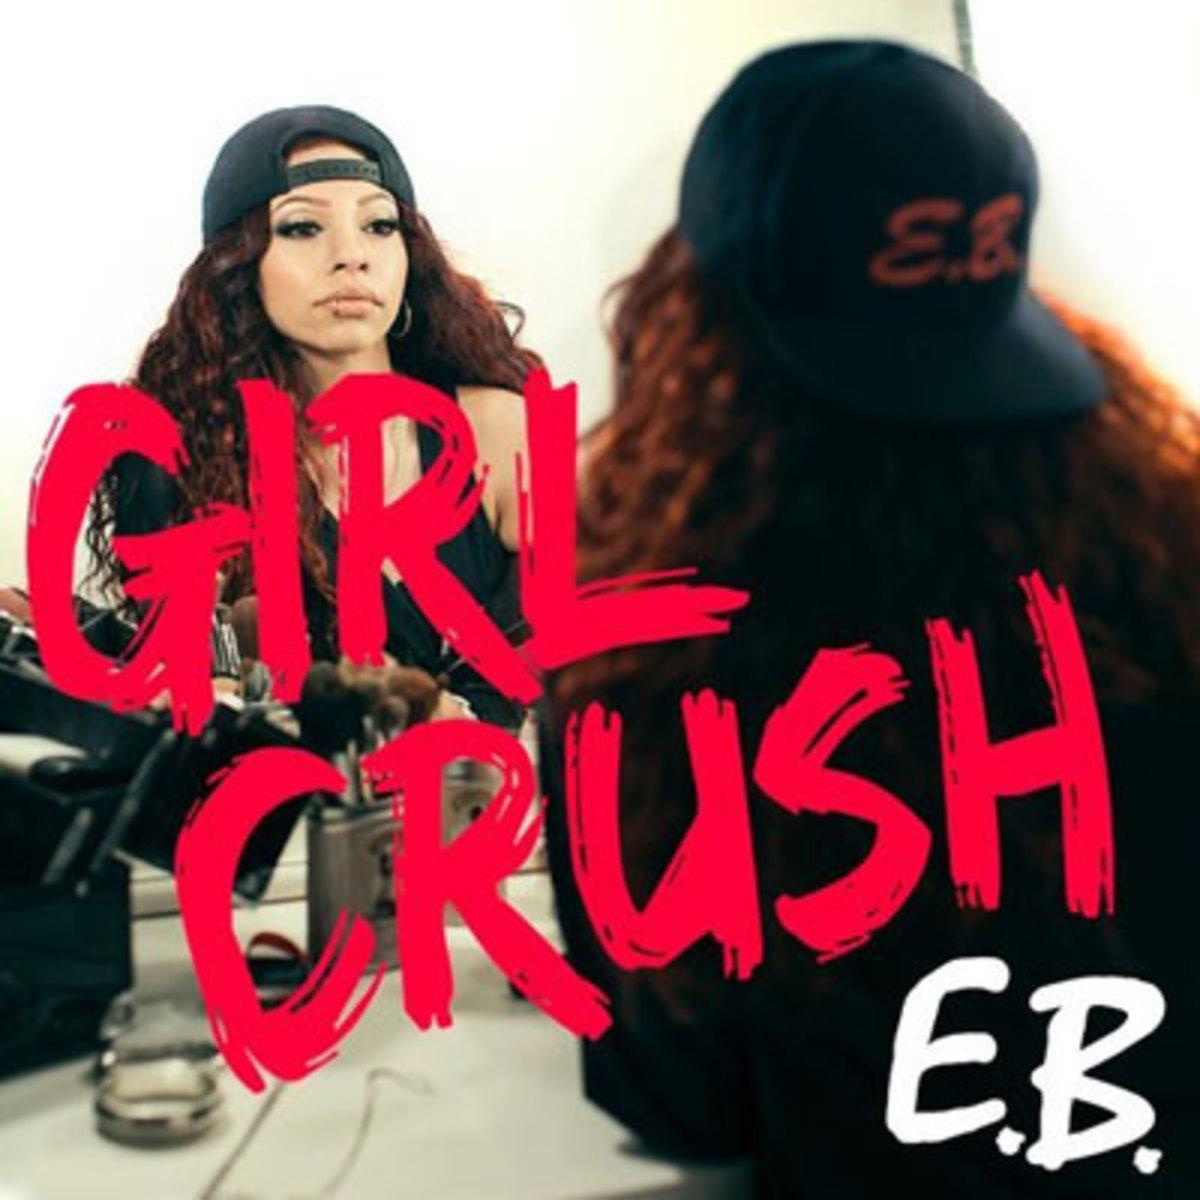 eb-girlcrush.jpg